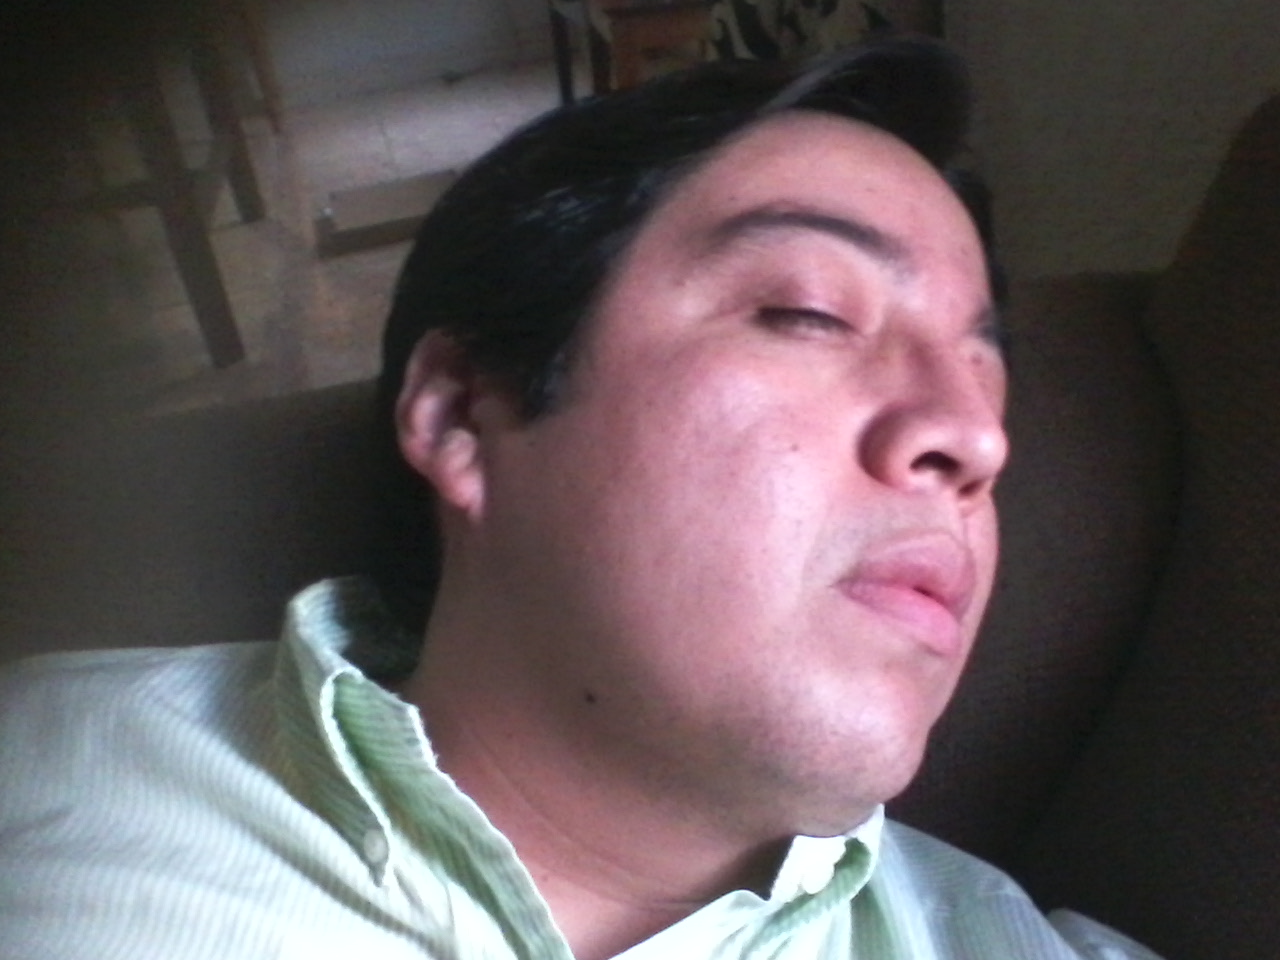 Mexi-Vocabulario: Arrullar